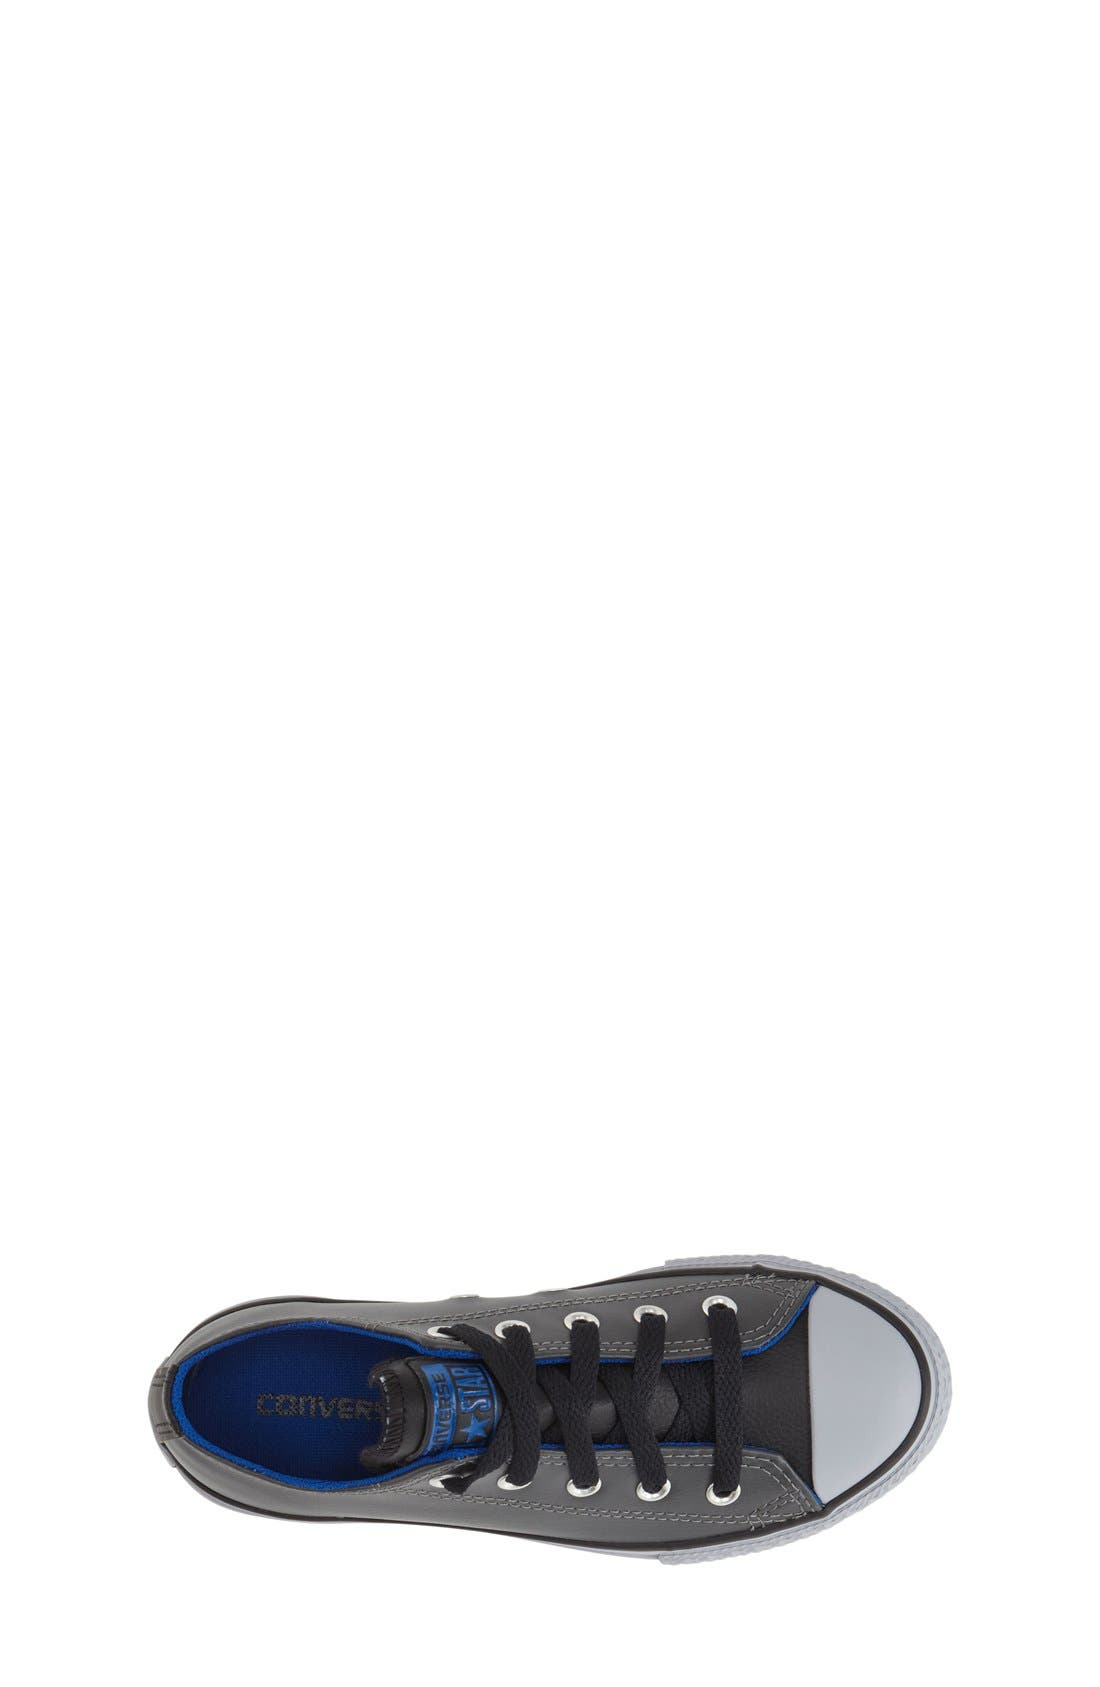 Alternate Image 3  - Converse Chuck Taylor® All Star® 'Ox' Sneaker (Toddler, Little Kid & Big Kid)